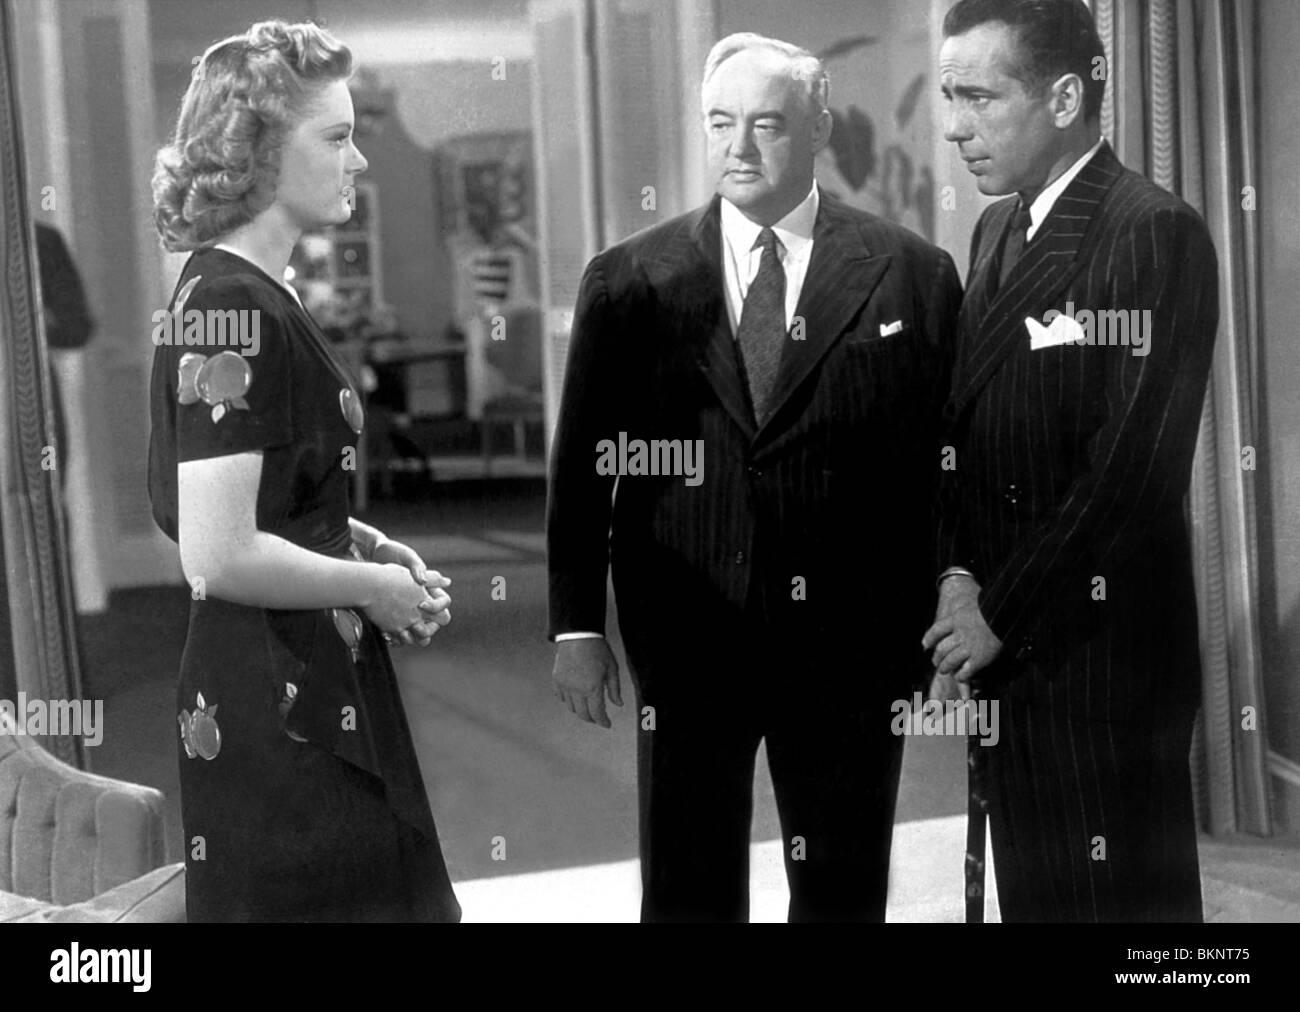 CONFLICT (1945) HUMPHREY BOGART, SYDNEY GREENSTREET CFLT 001 - Stock Image